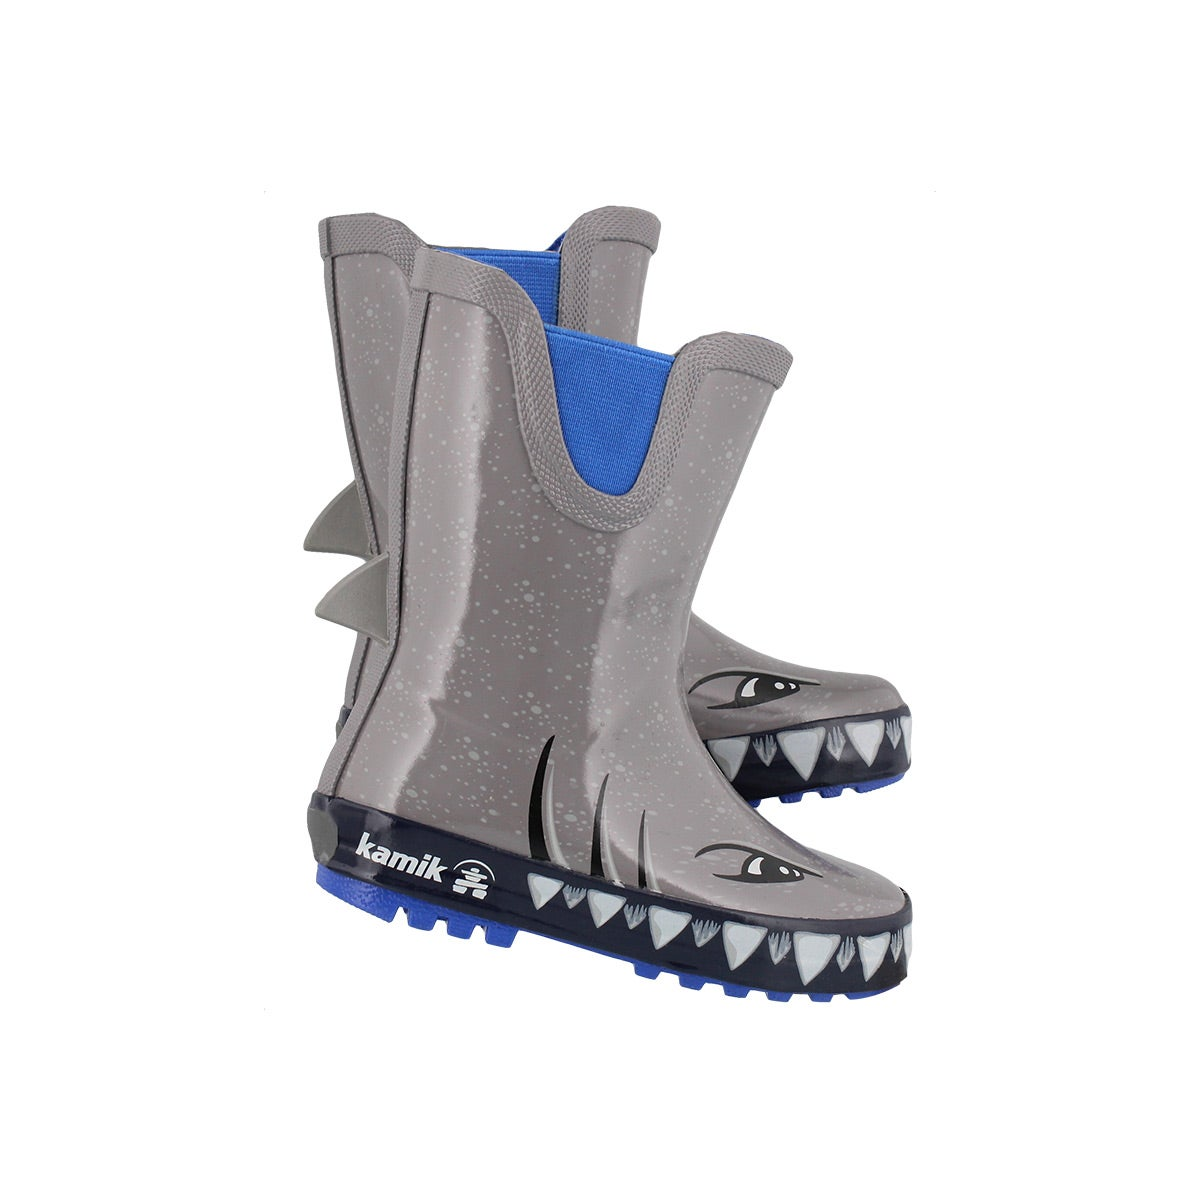 Infs-b Sharky grey wtpf rain boot